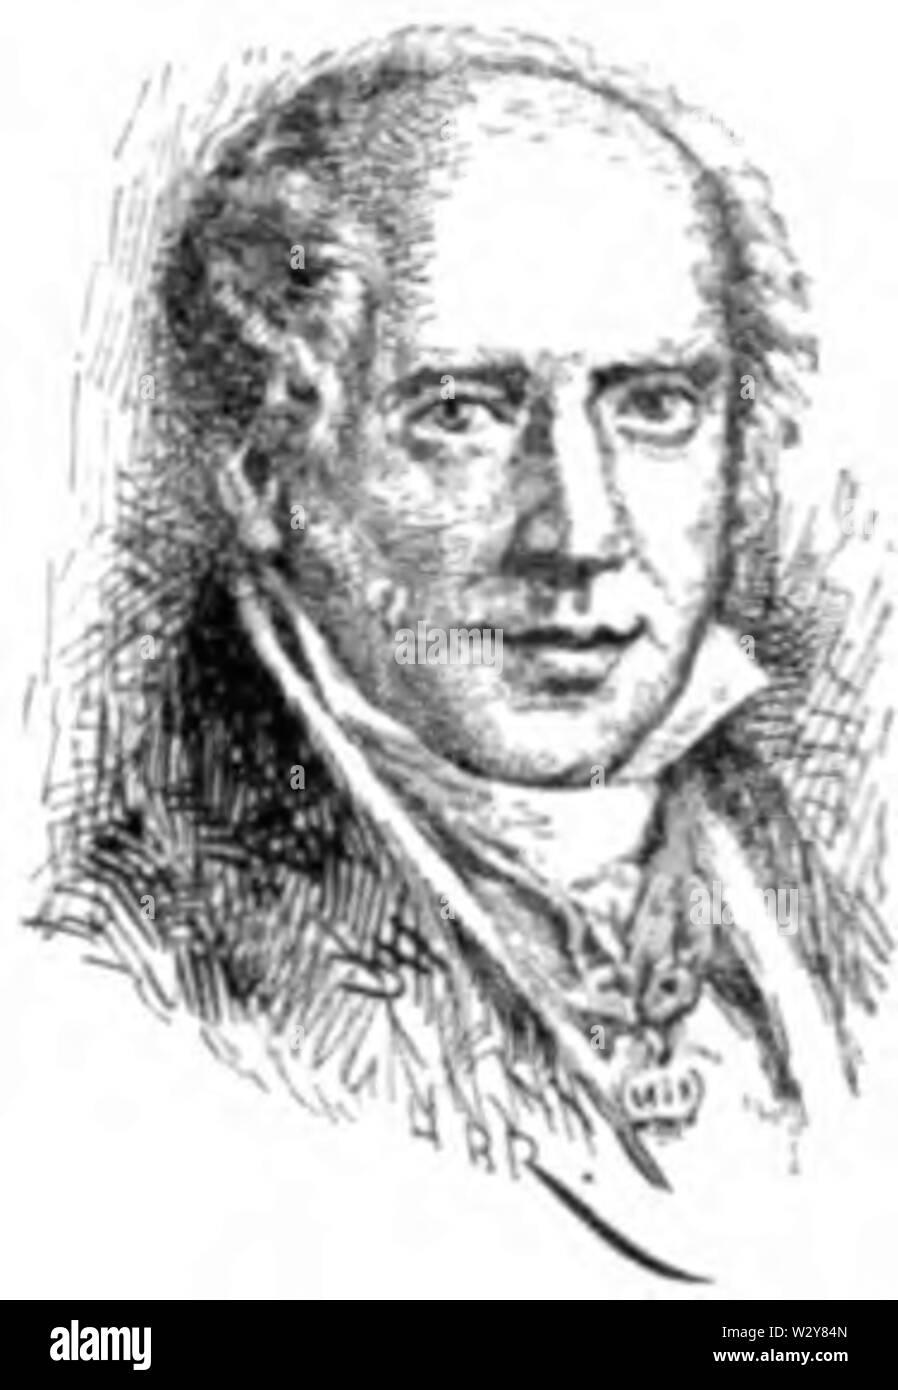 Mayer Amschel Rothschild - The Jewish Encyclopedia 1907 - Stock Image